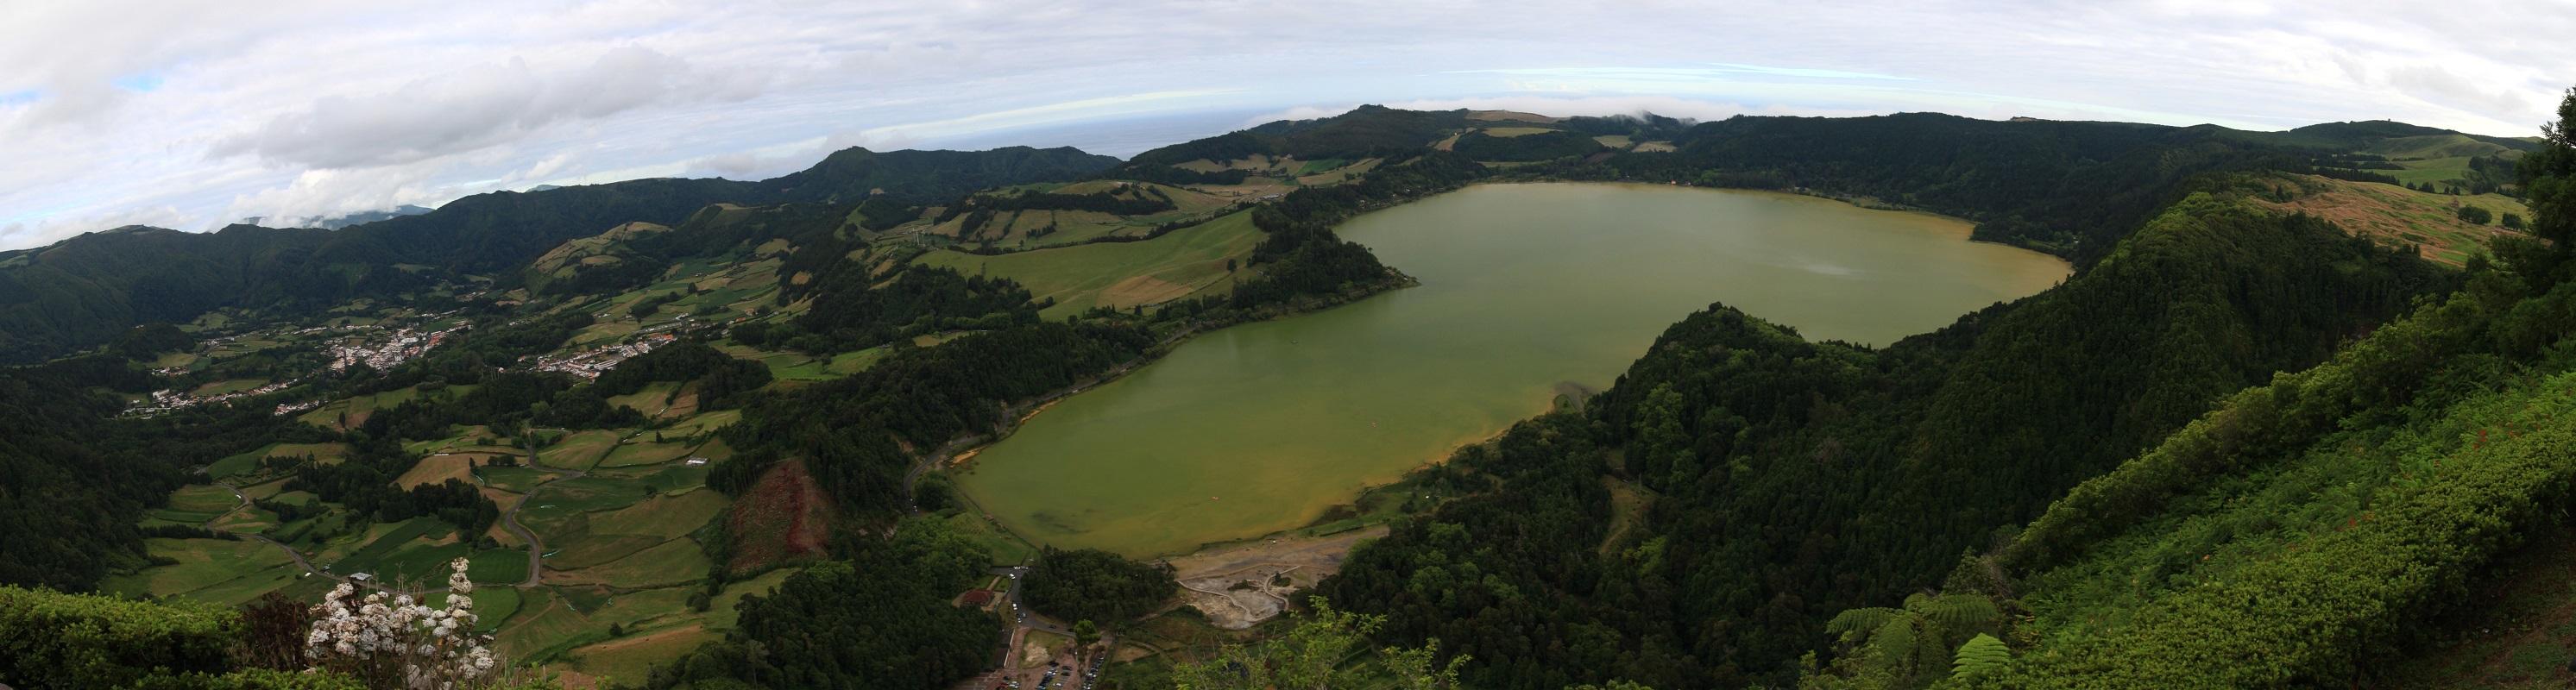 Ausblick vom Pico do Ferro auf Furnas